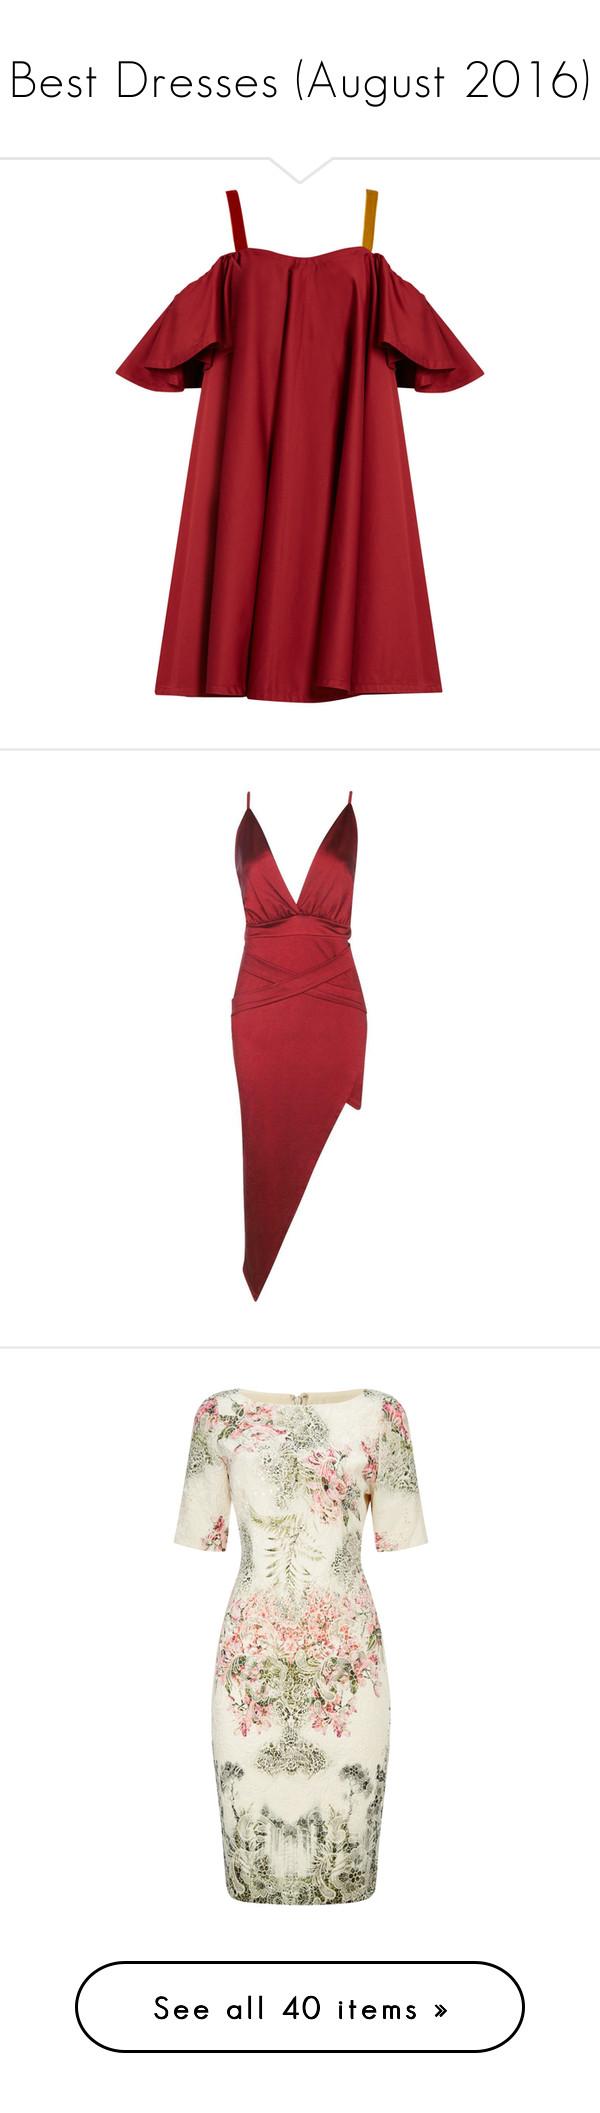 Best dresses august